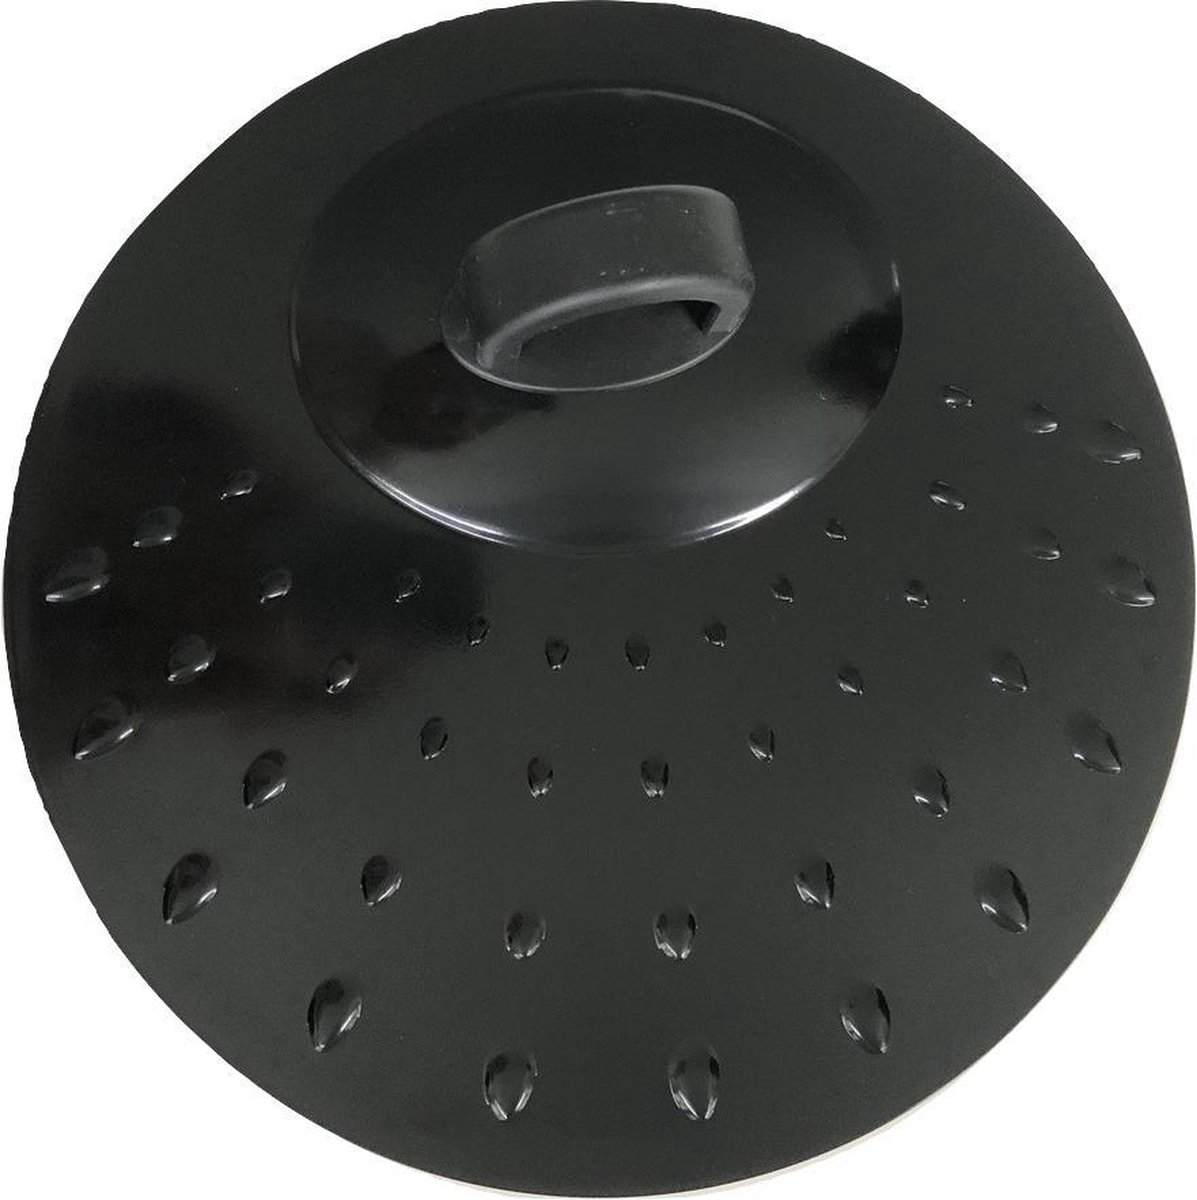 Cook King Anti-spatdeksel - 30 cm